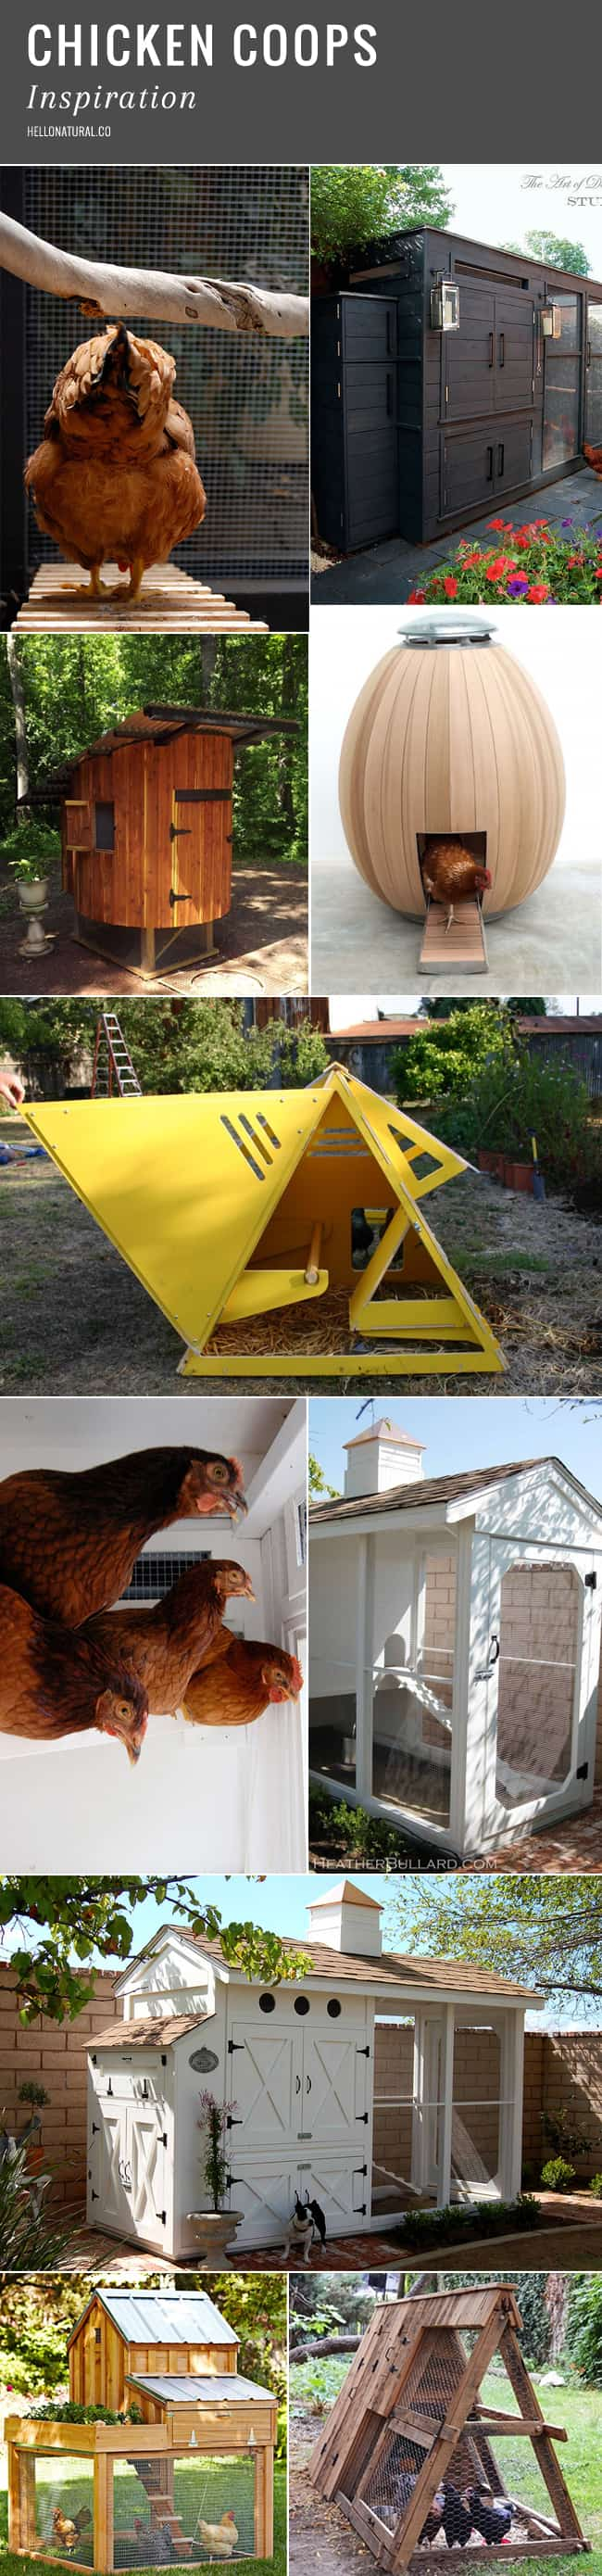 Backyard Chicken Coop Designs | HelloGlow.co